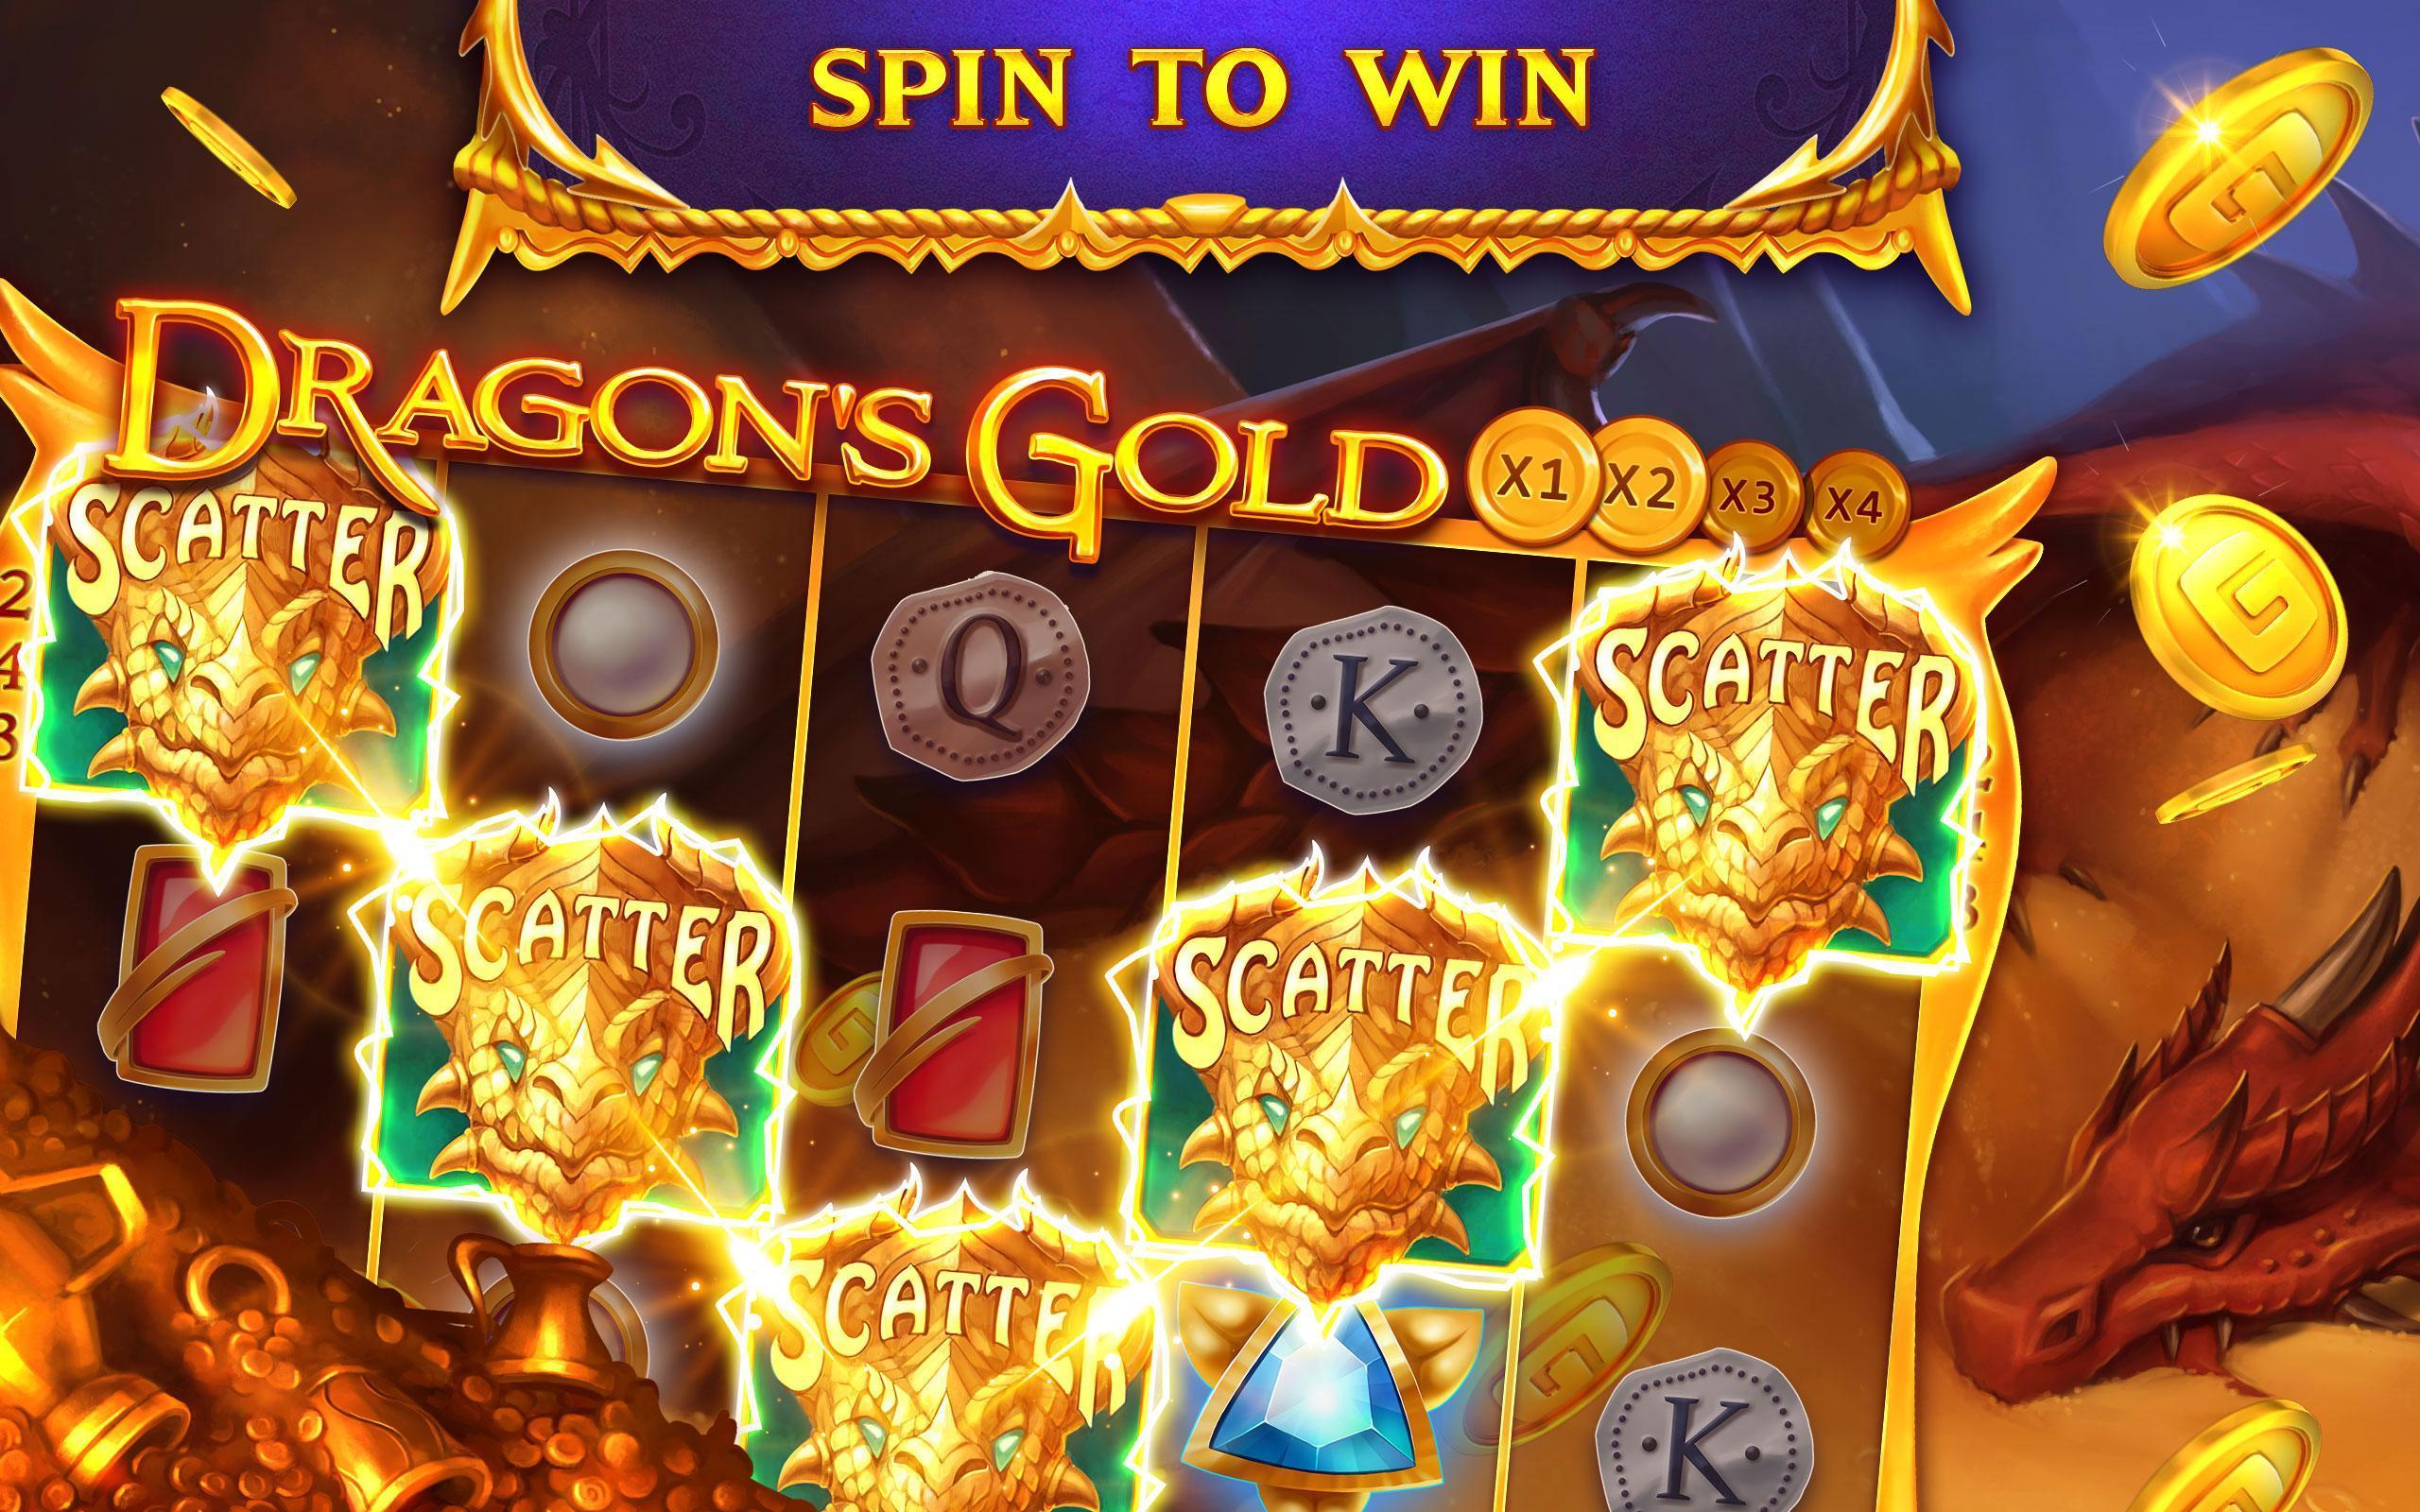 Winning dragons gold steroids frank